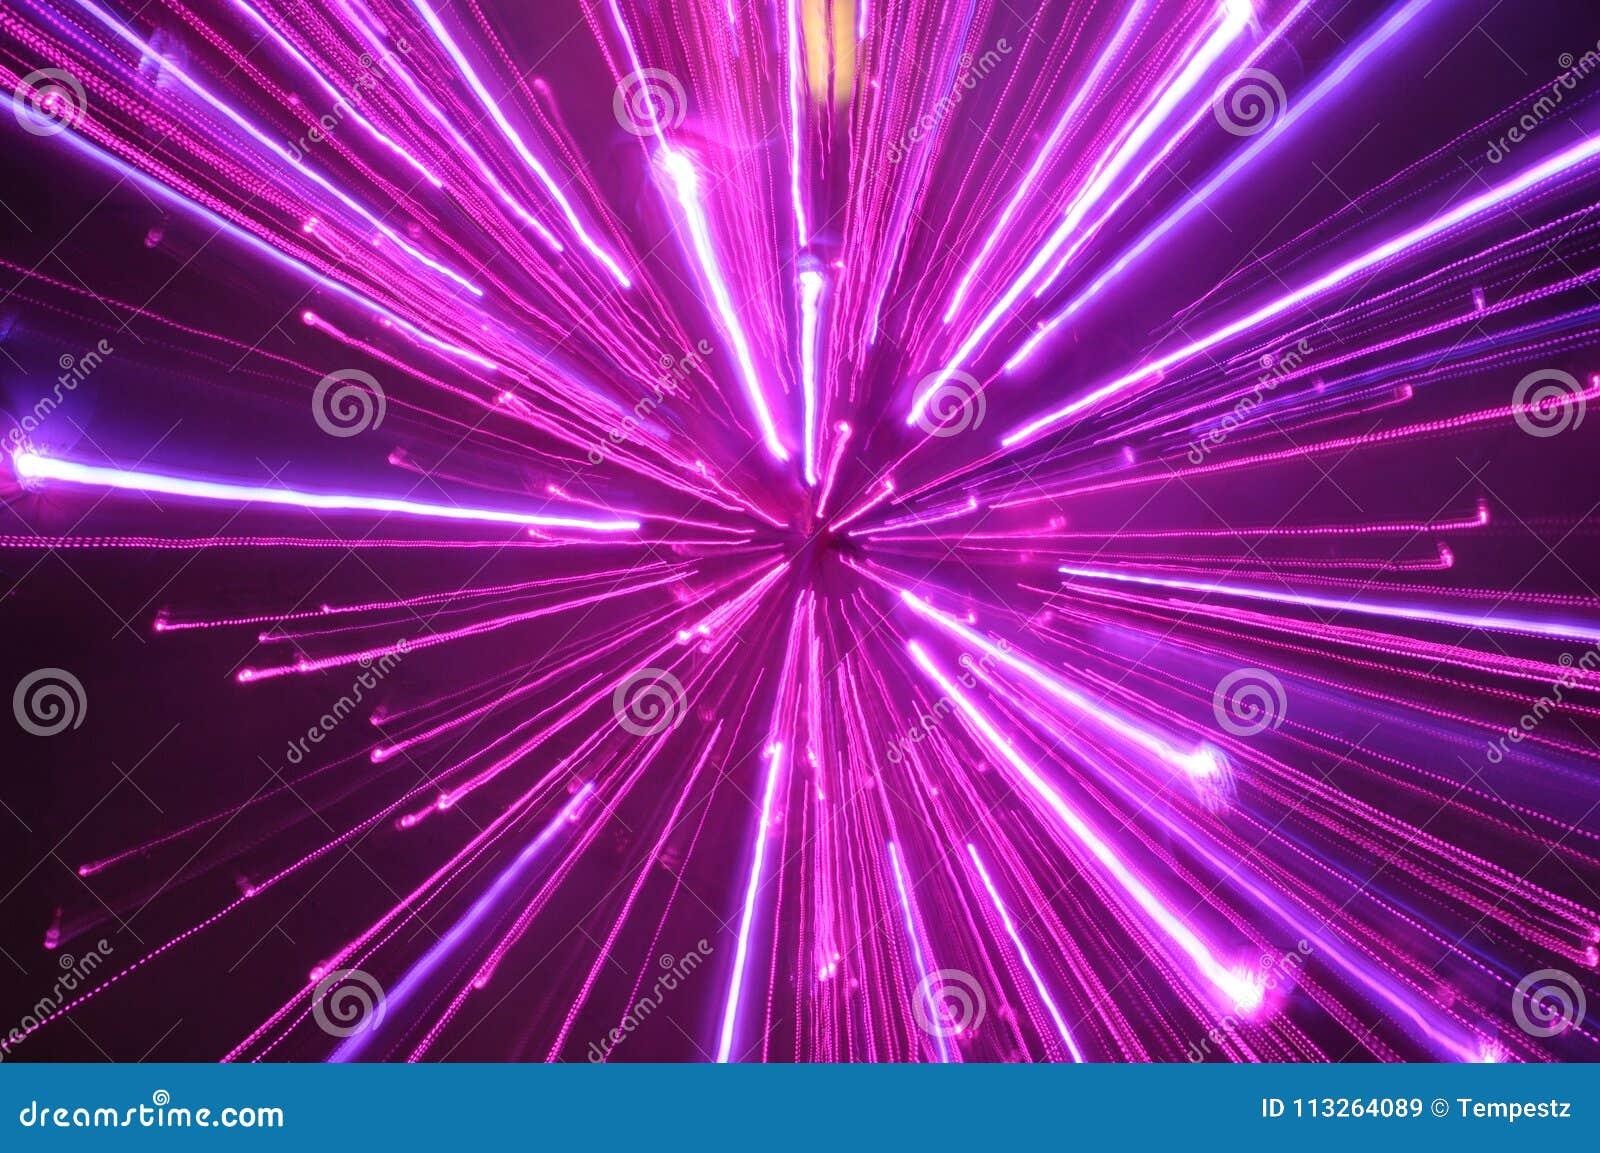 Abstract violet light streak blurs